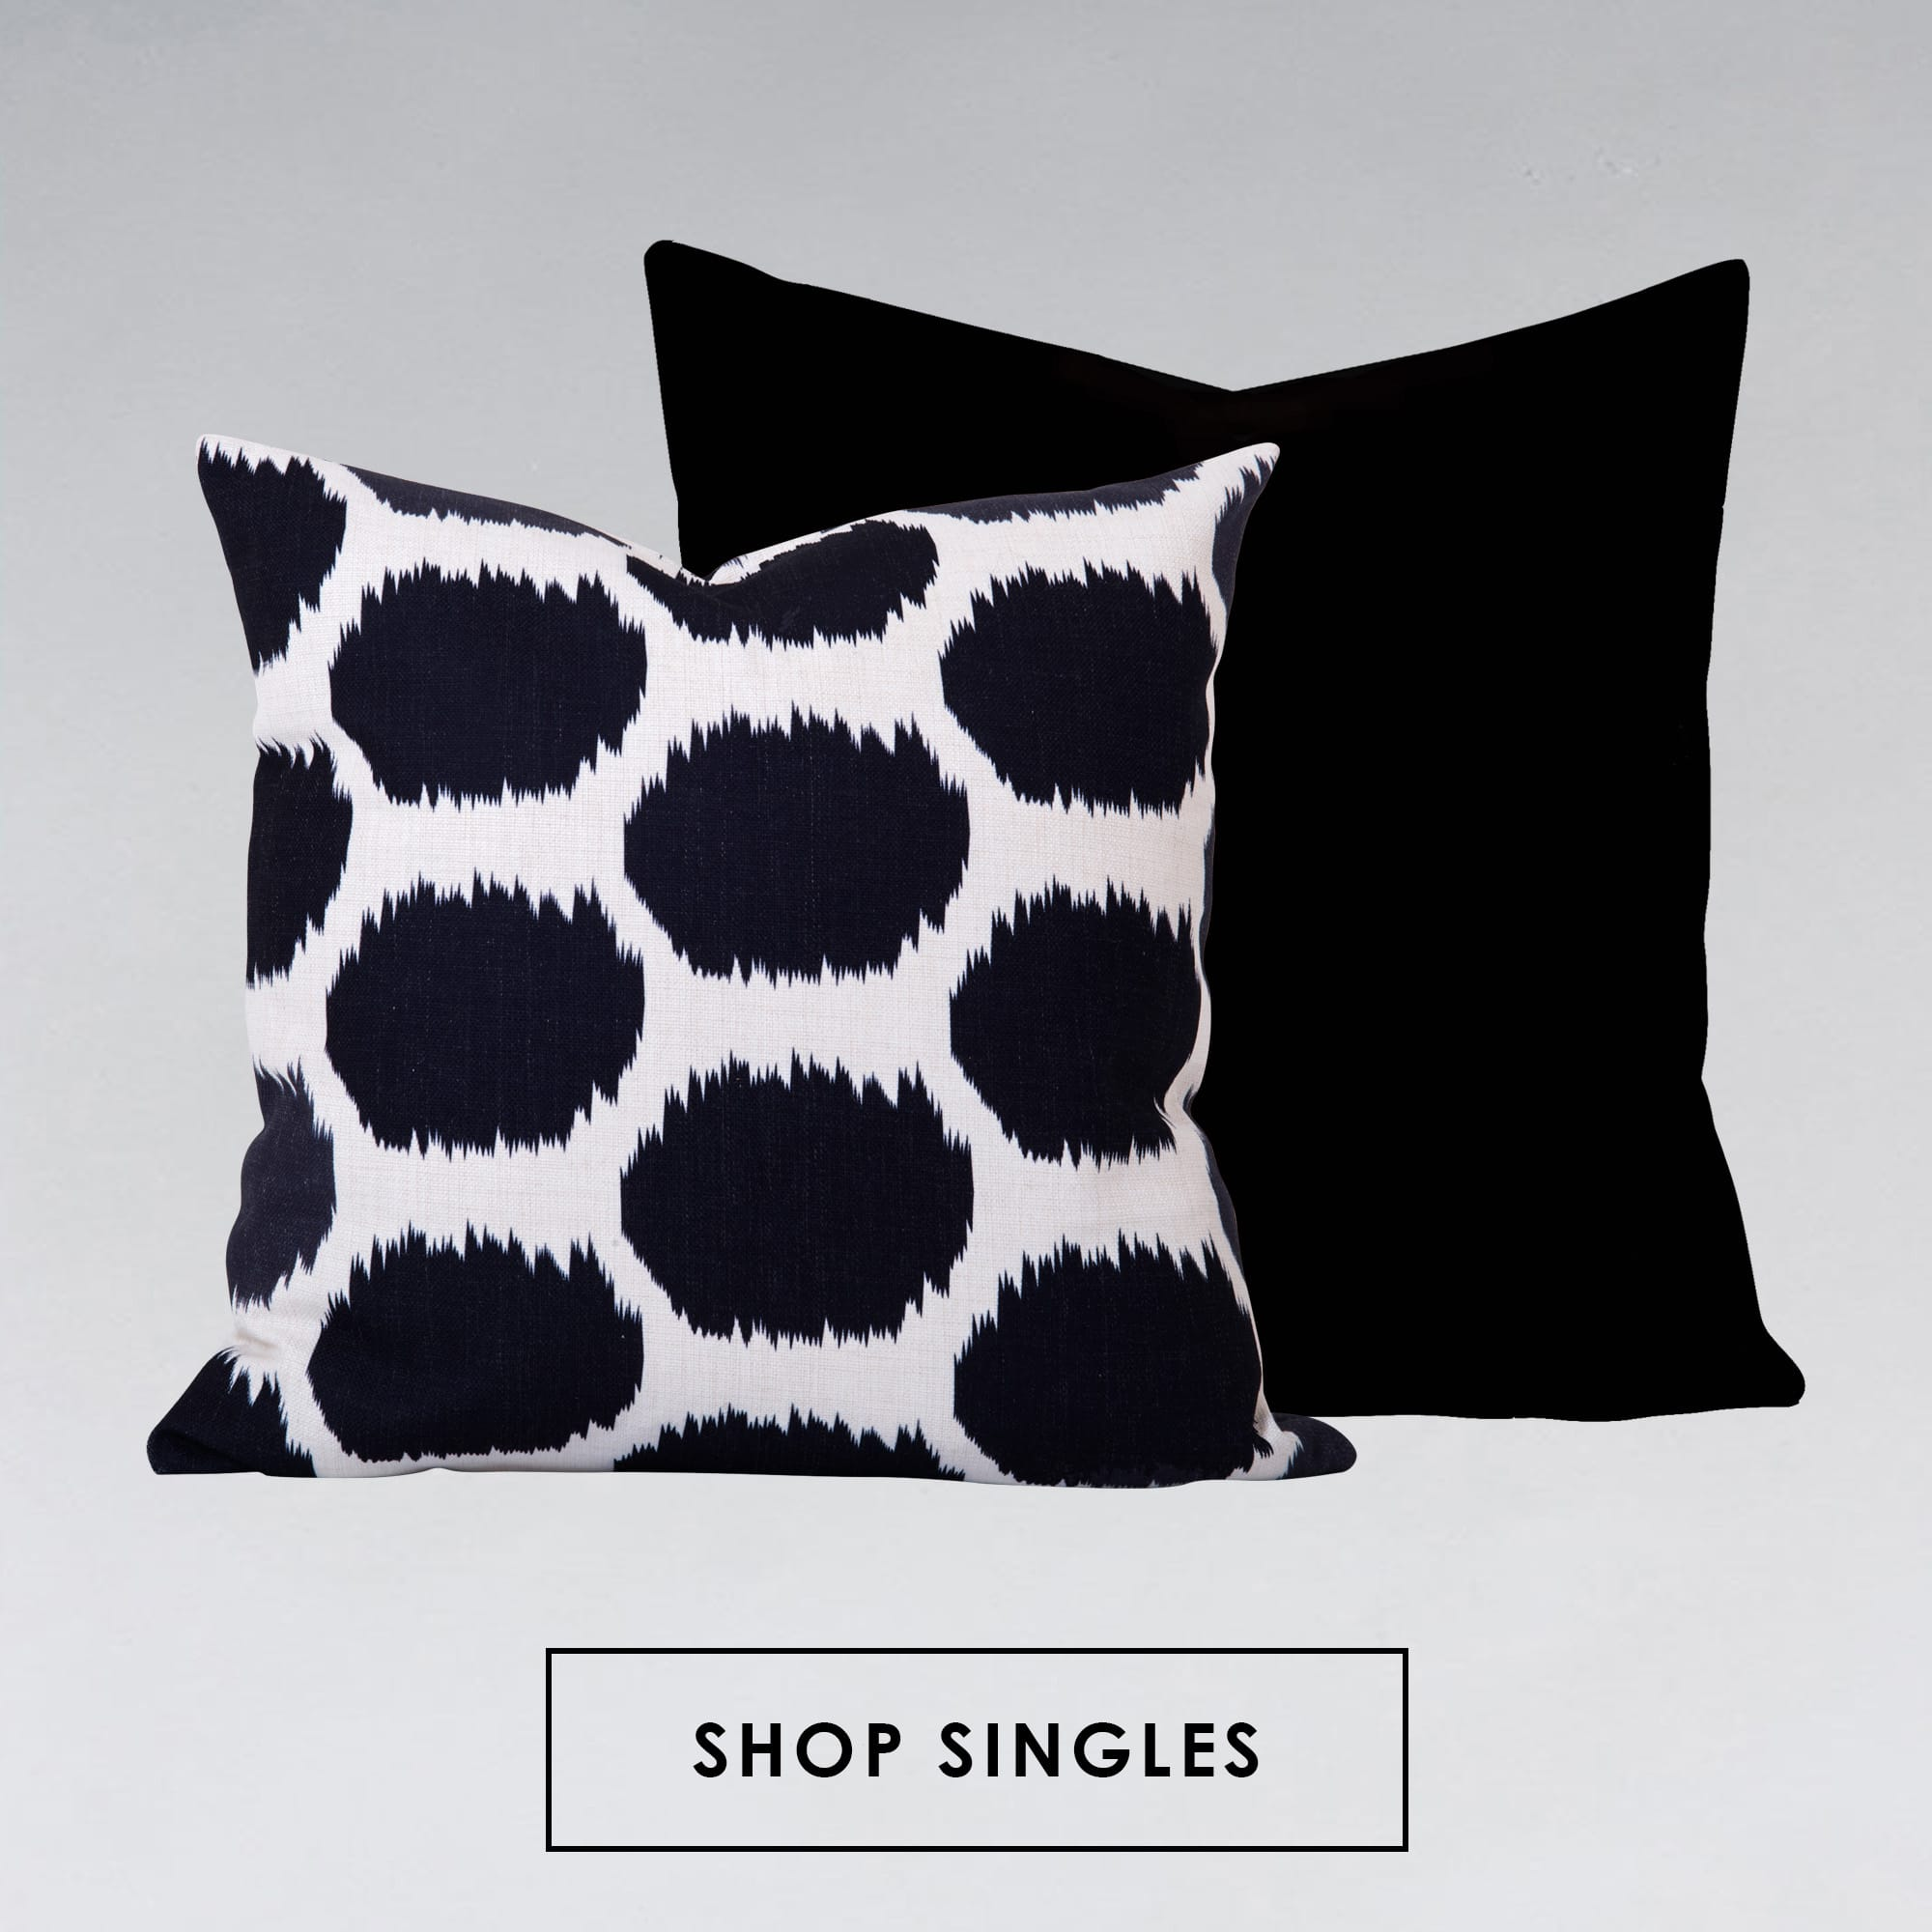 Arzu Black Ikat Cushion and Georgia Plain Black Cushion